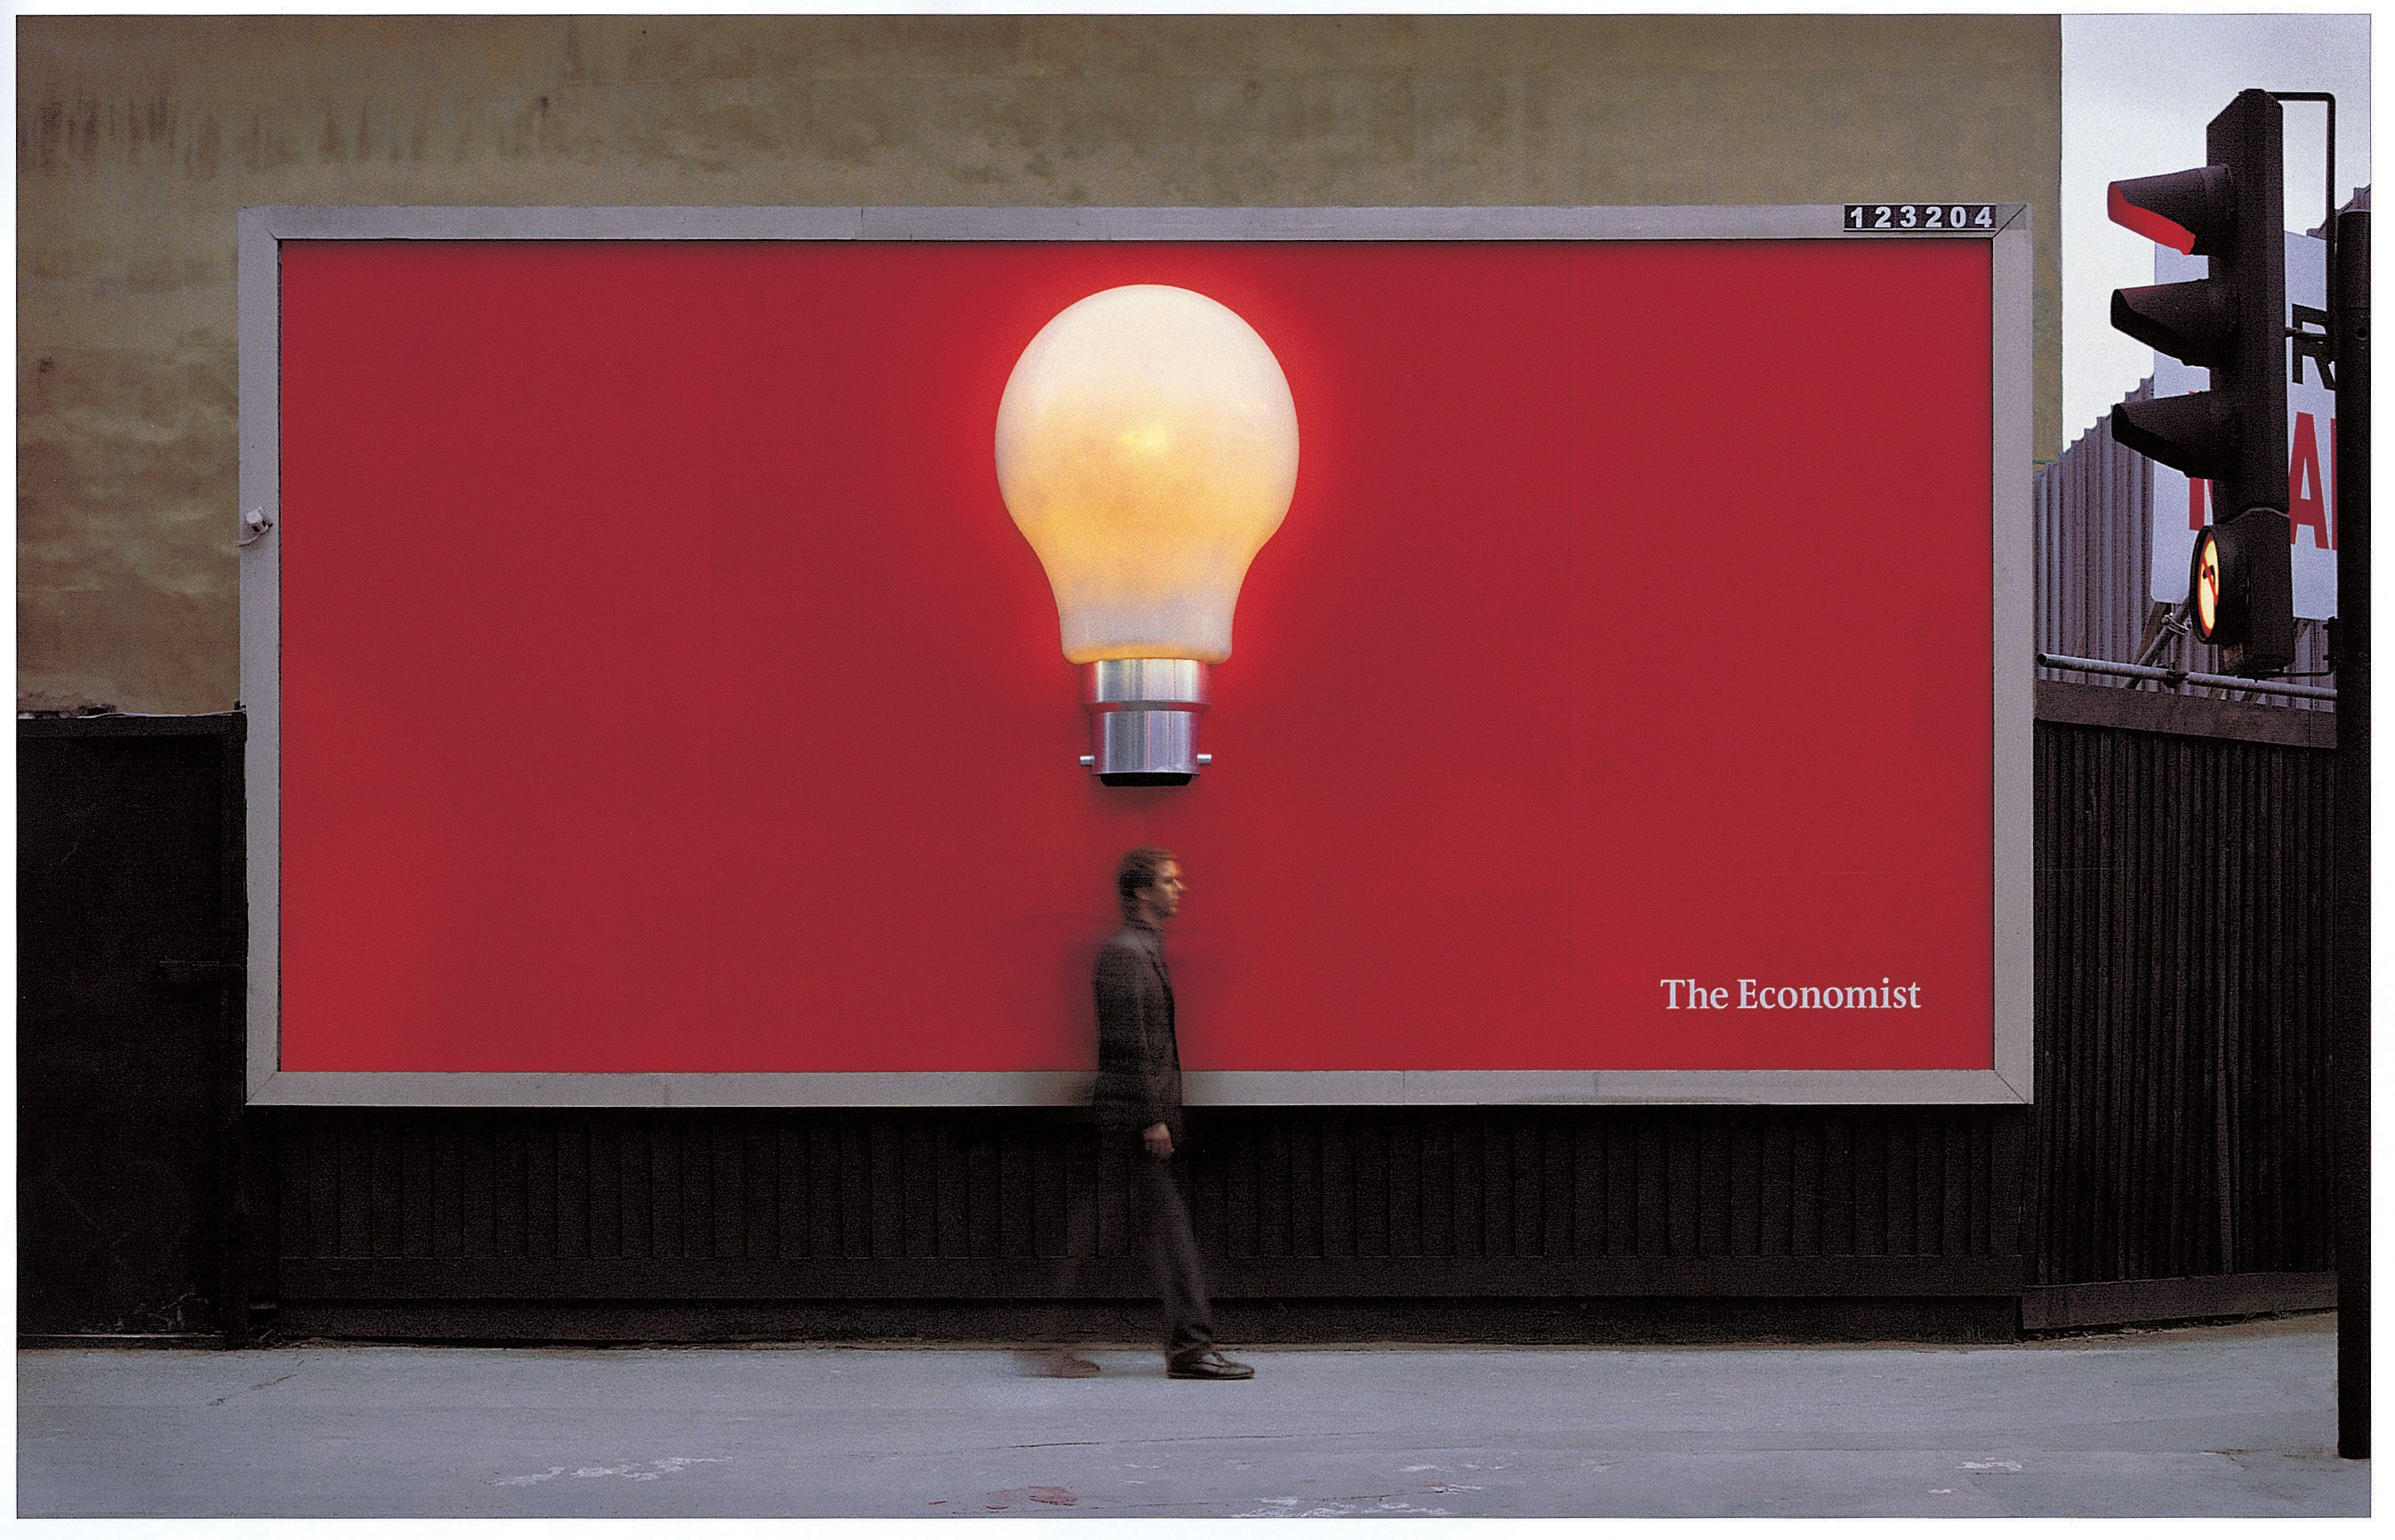 economist_billboard.jpeg (2693×1732)